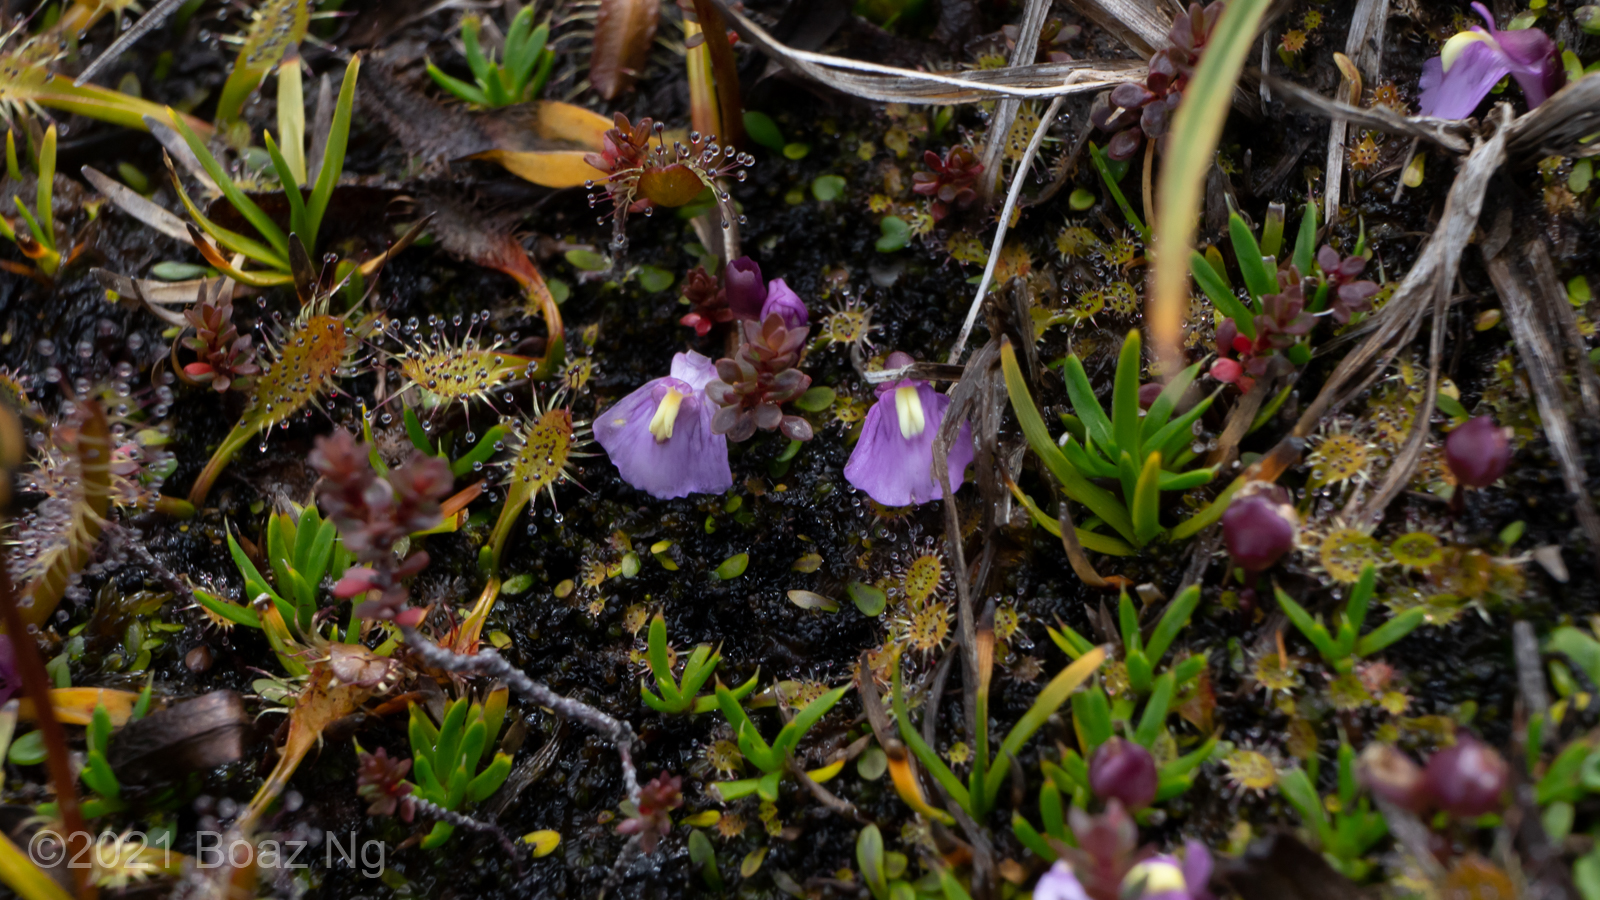 Species spotlight: Utricularia dichotoma subsp. monanthos